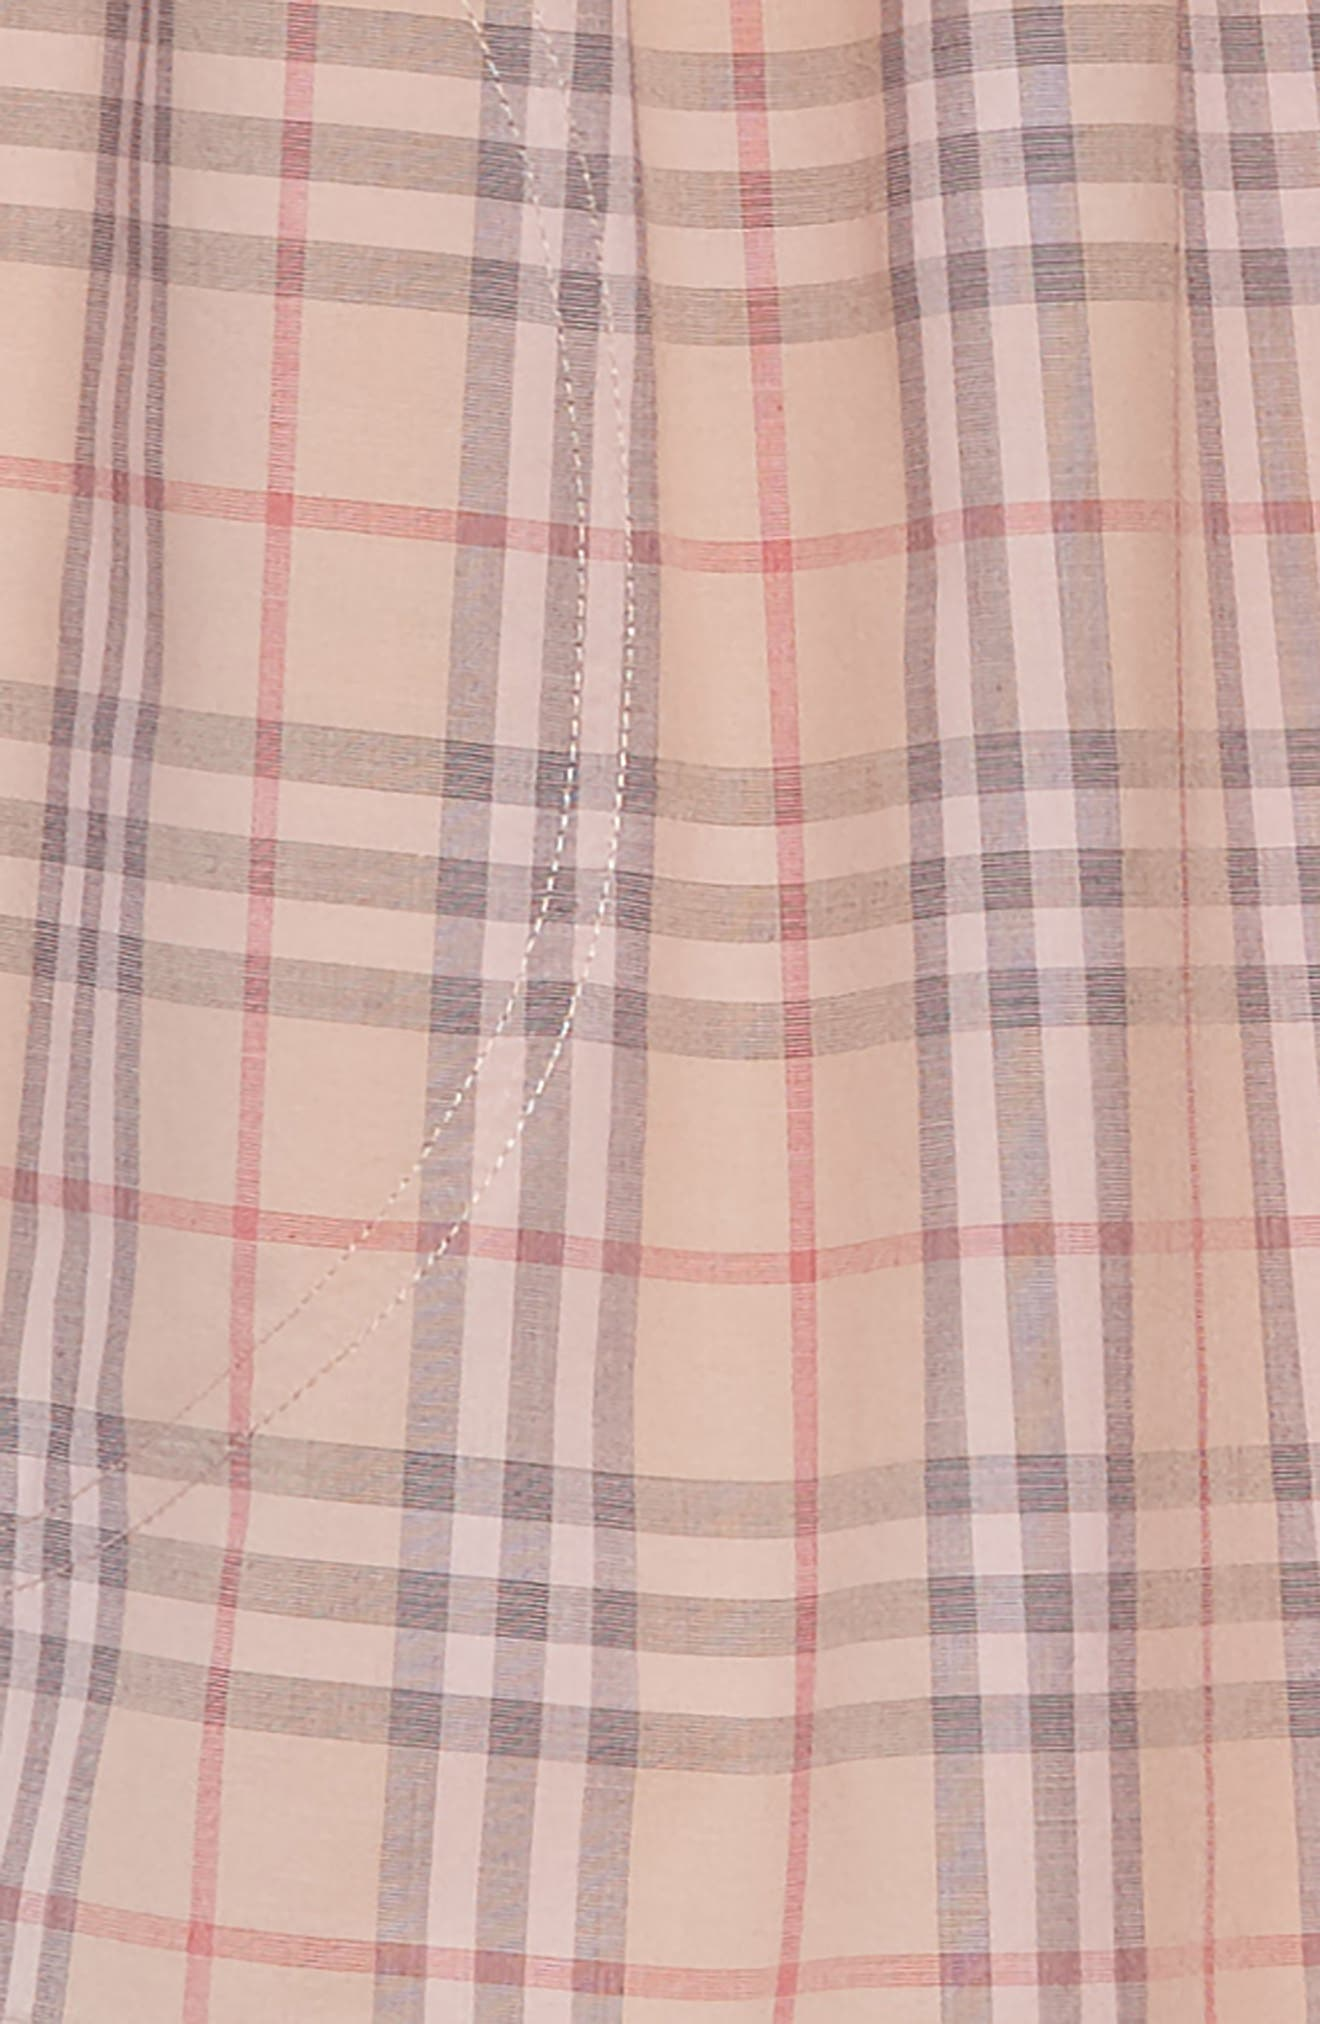 Mini Loralie Ruffle Detail Check Cotton Dress,                             Alternate thumbnail 3, color,                             PALE PINK